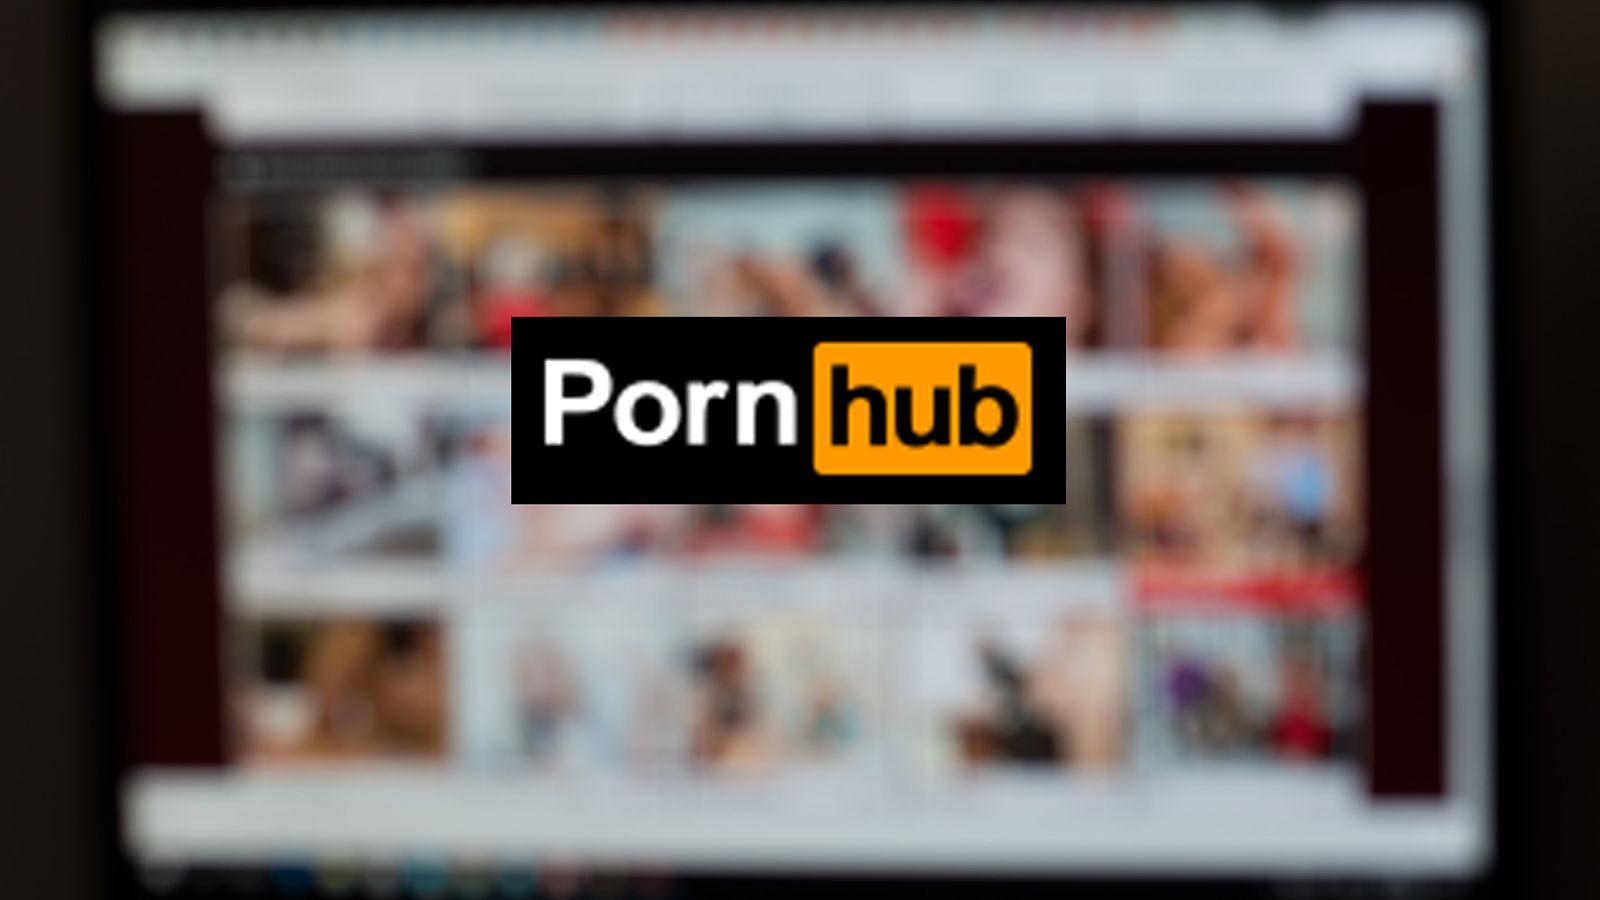 studentu porno naisille suunnattu porno